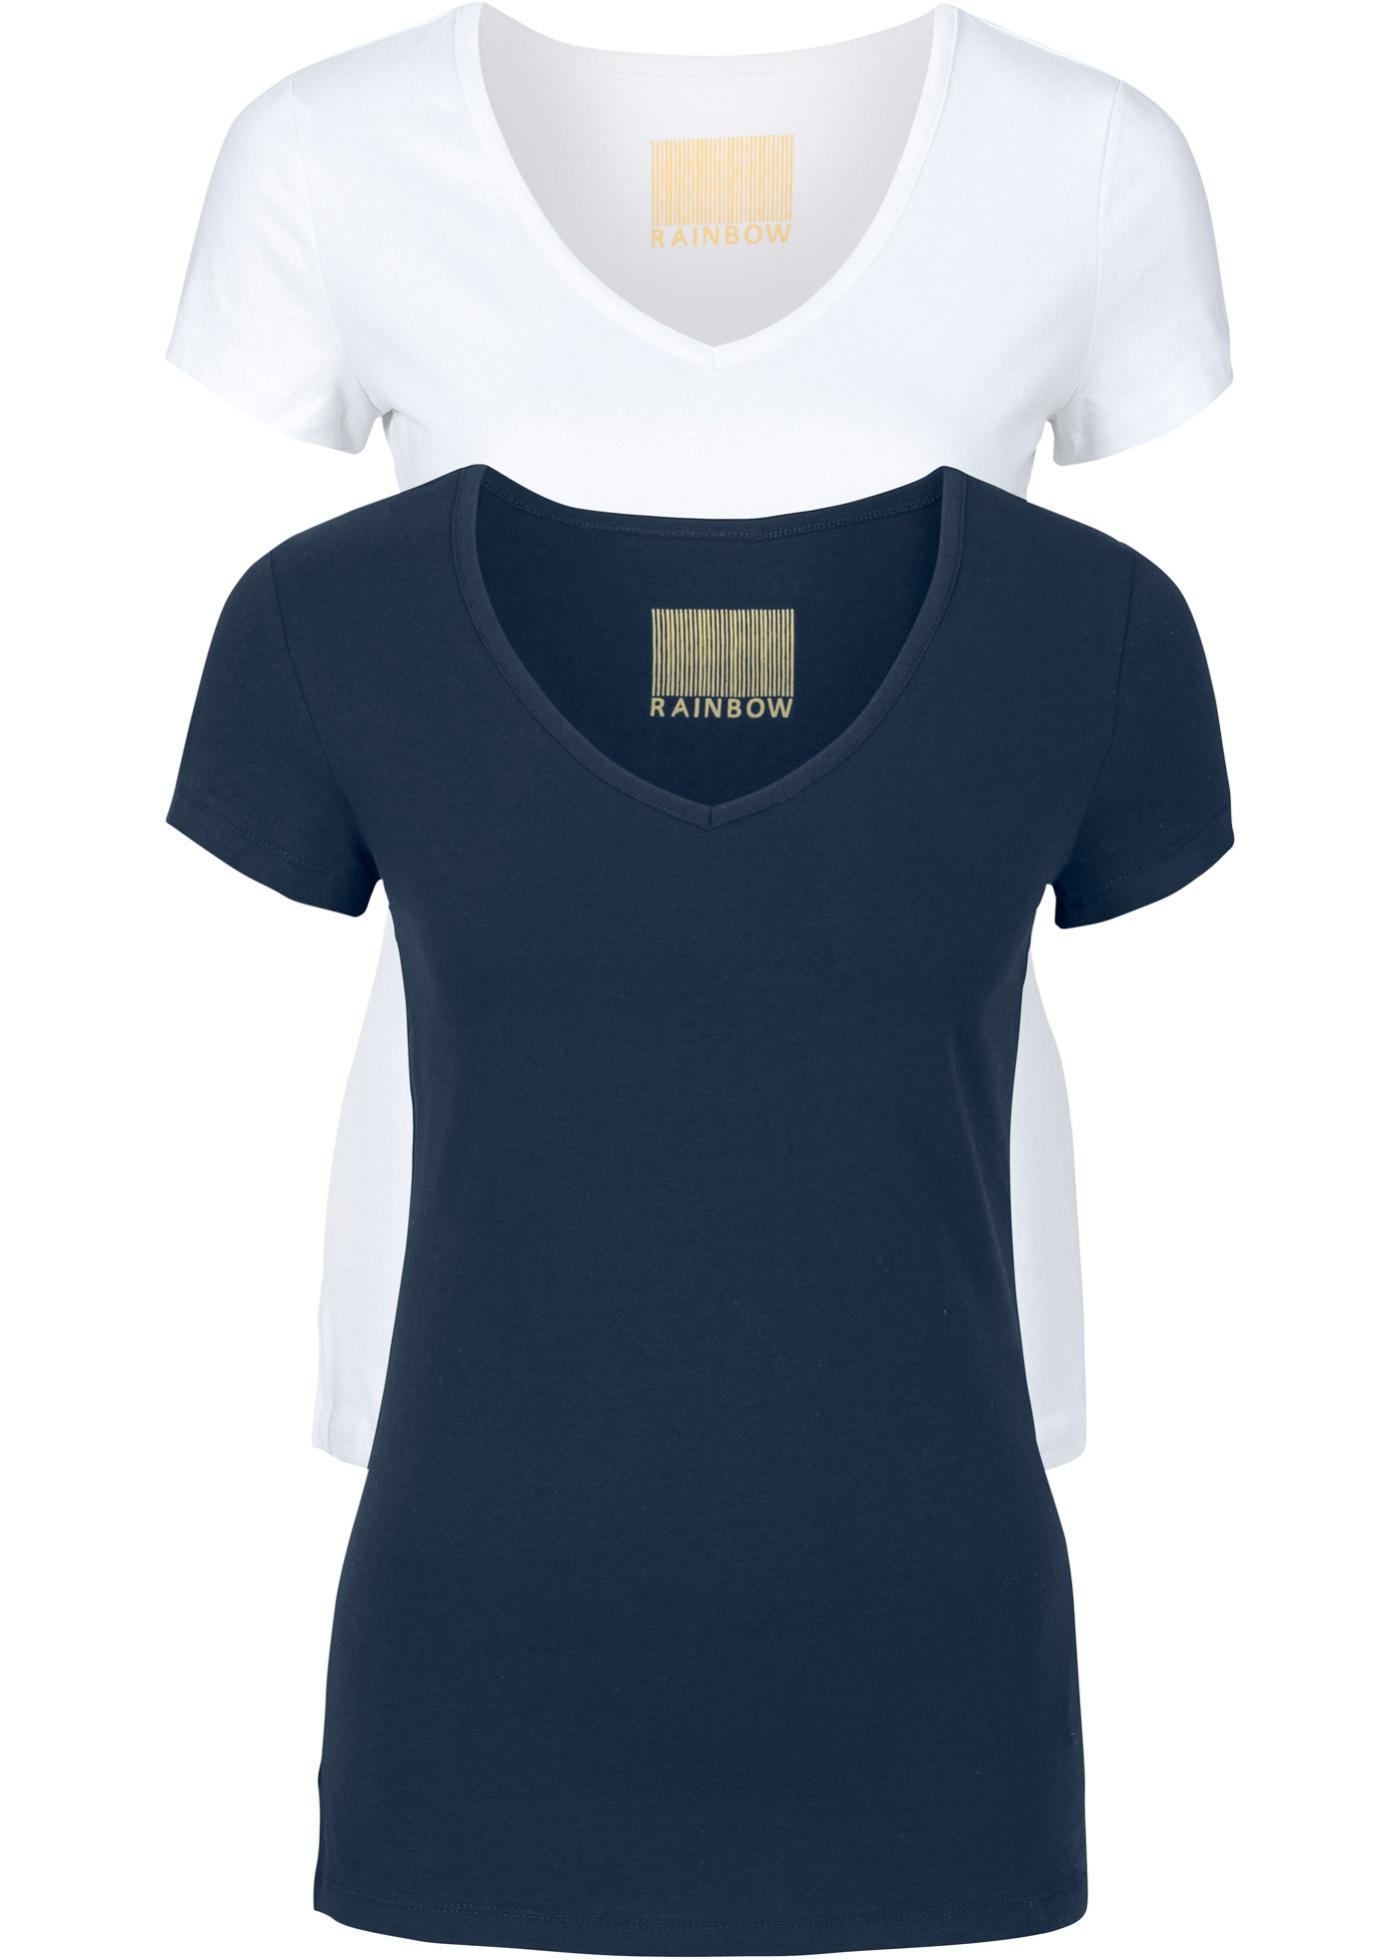 Bilde av 2-pakning, T-shirt for dame, rund hals